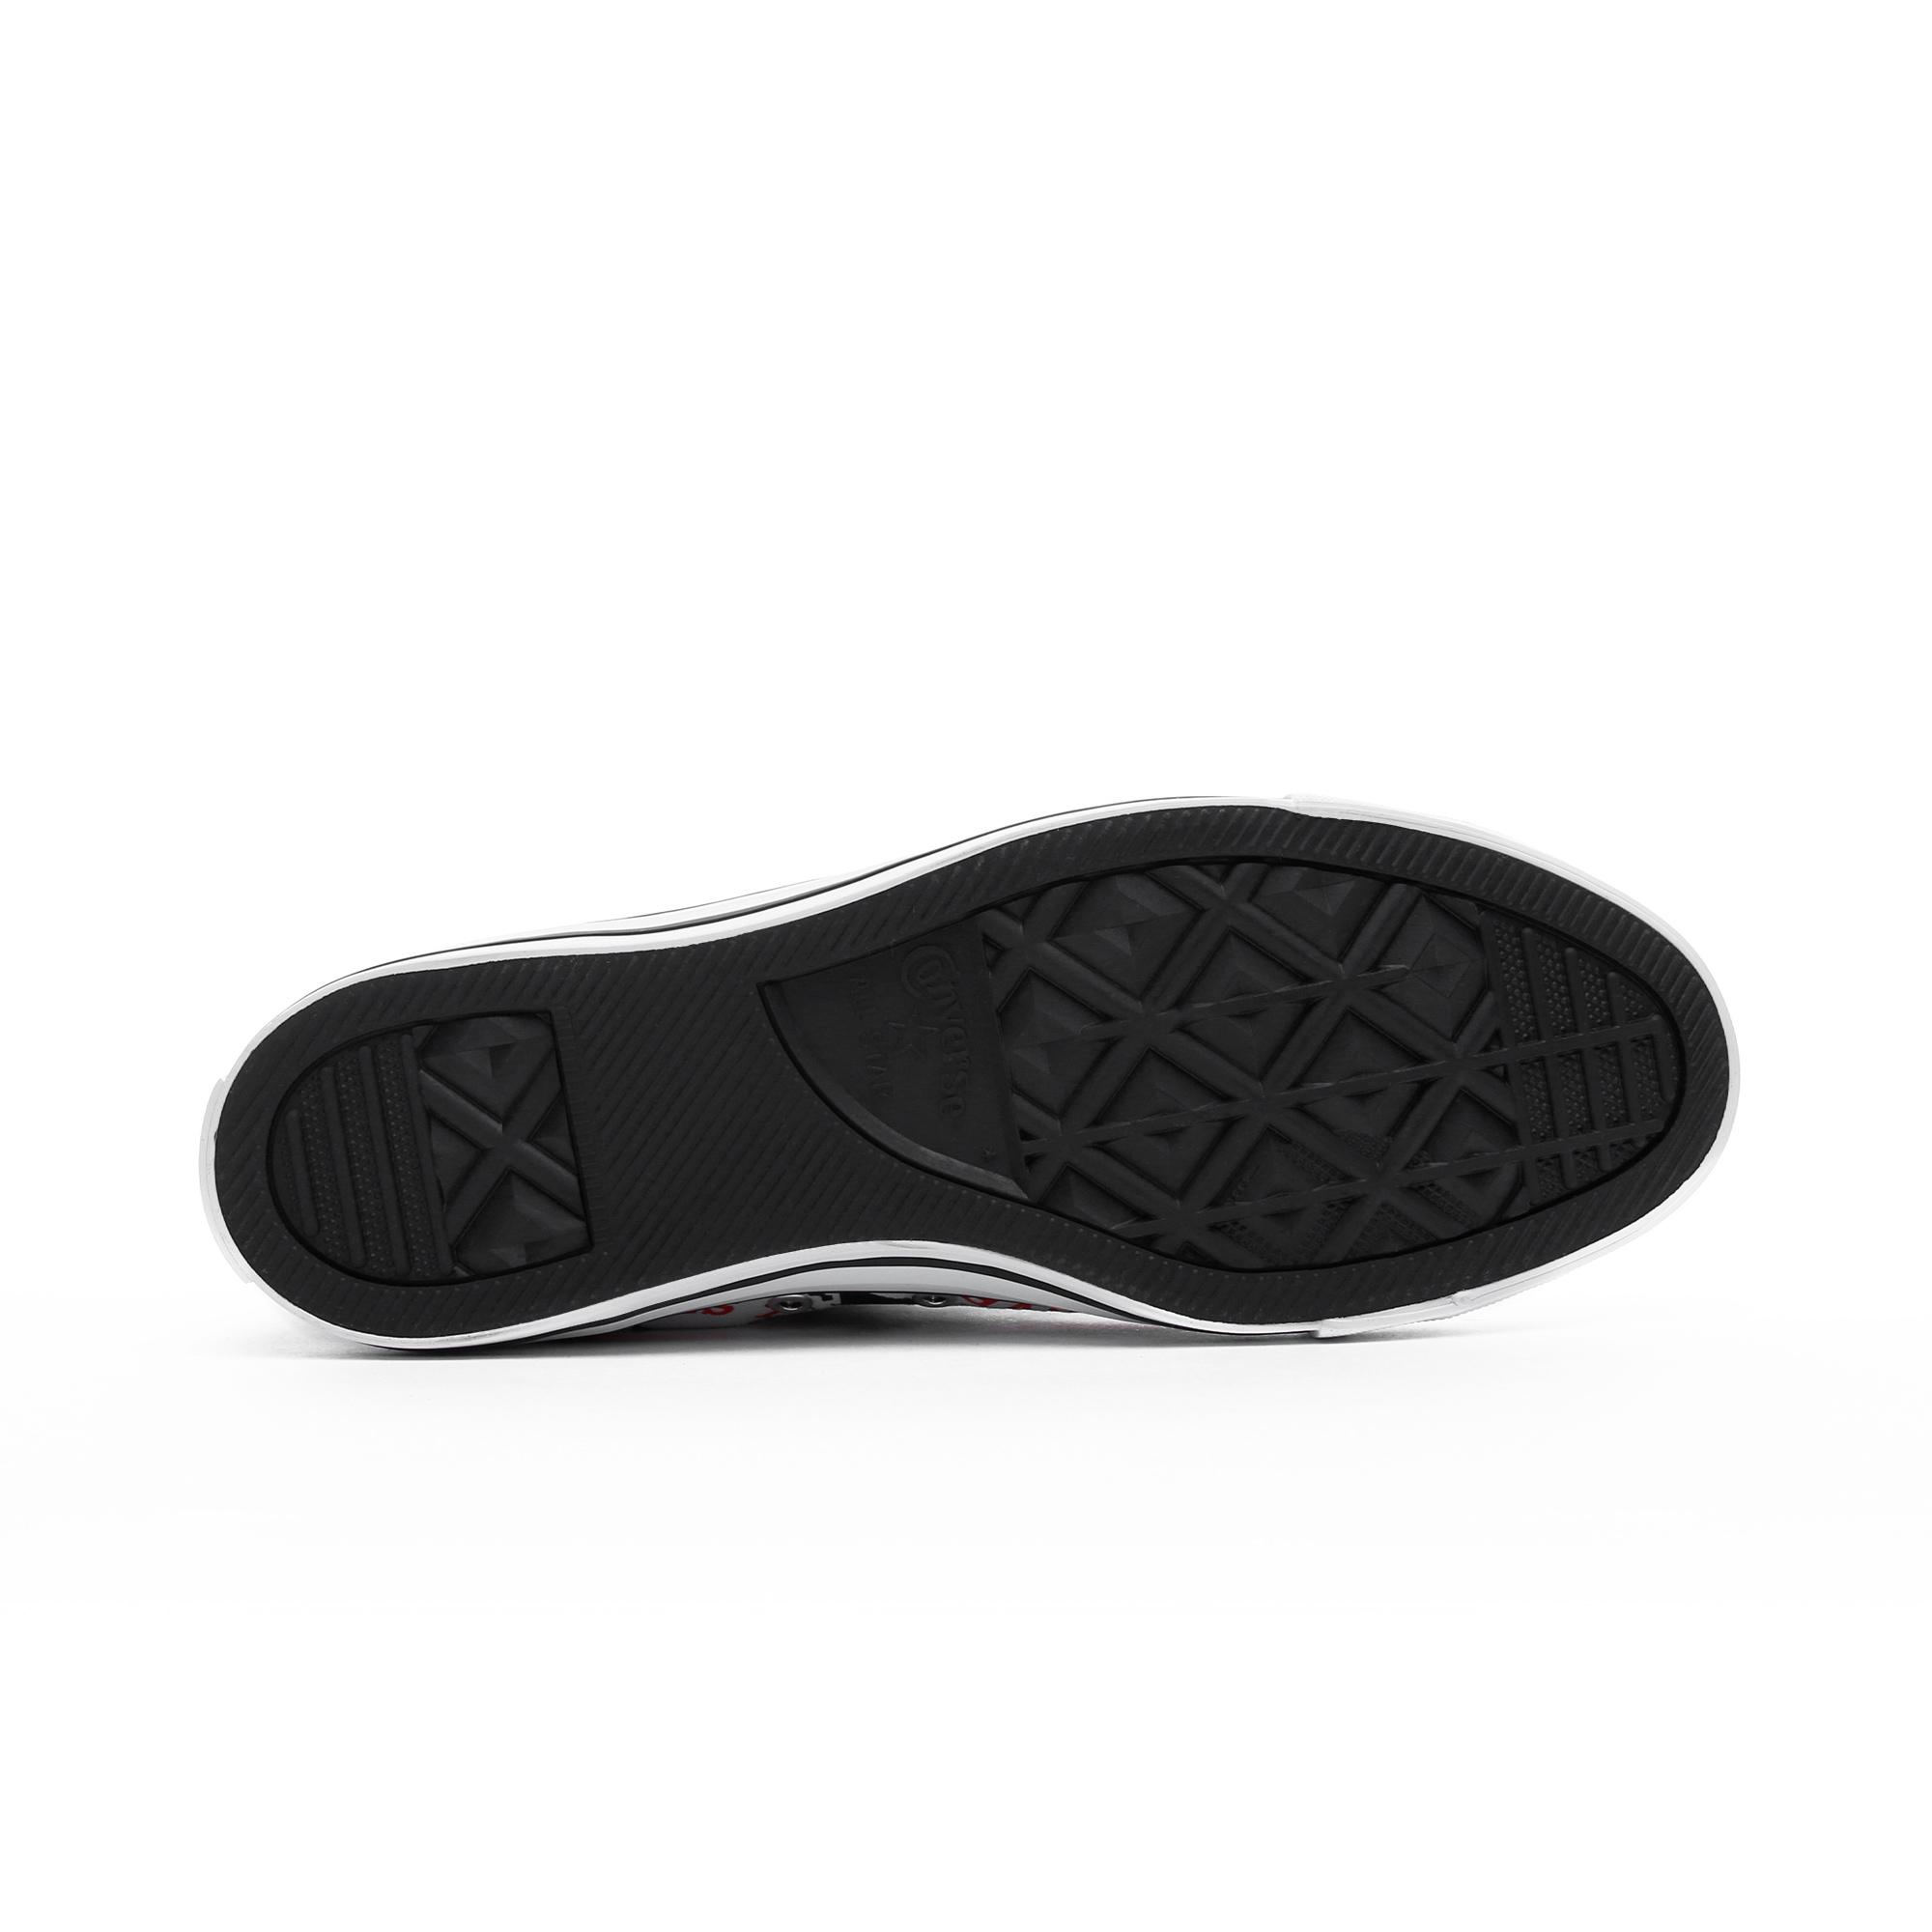 Converse Chuck Taylor All Star Hi Erkek Siyah Sneaker